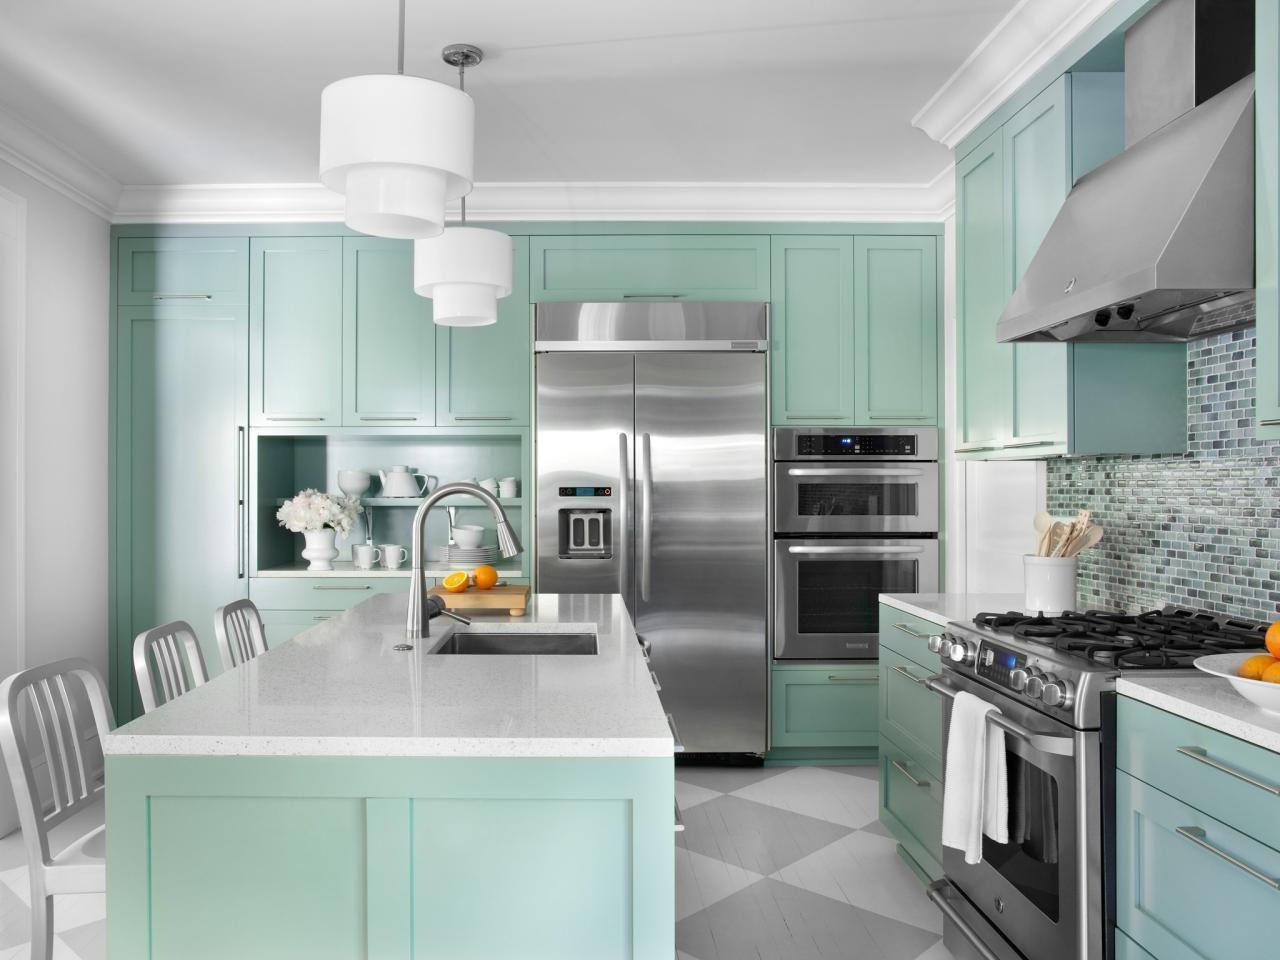 Elegant white kitchen fair cabinet ideas golime diy kitchen cabinet